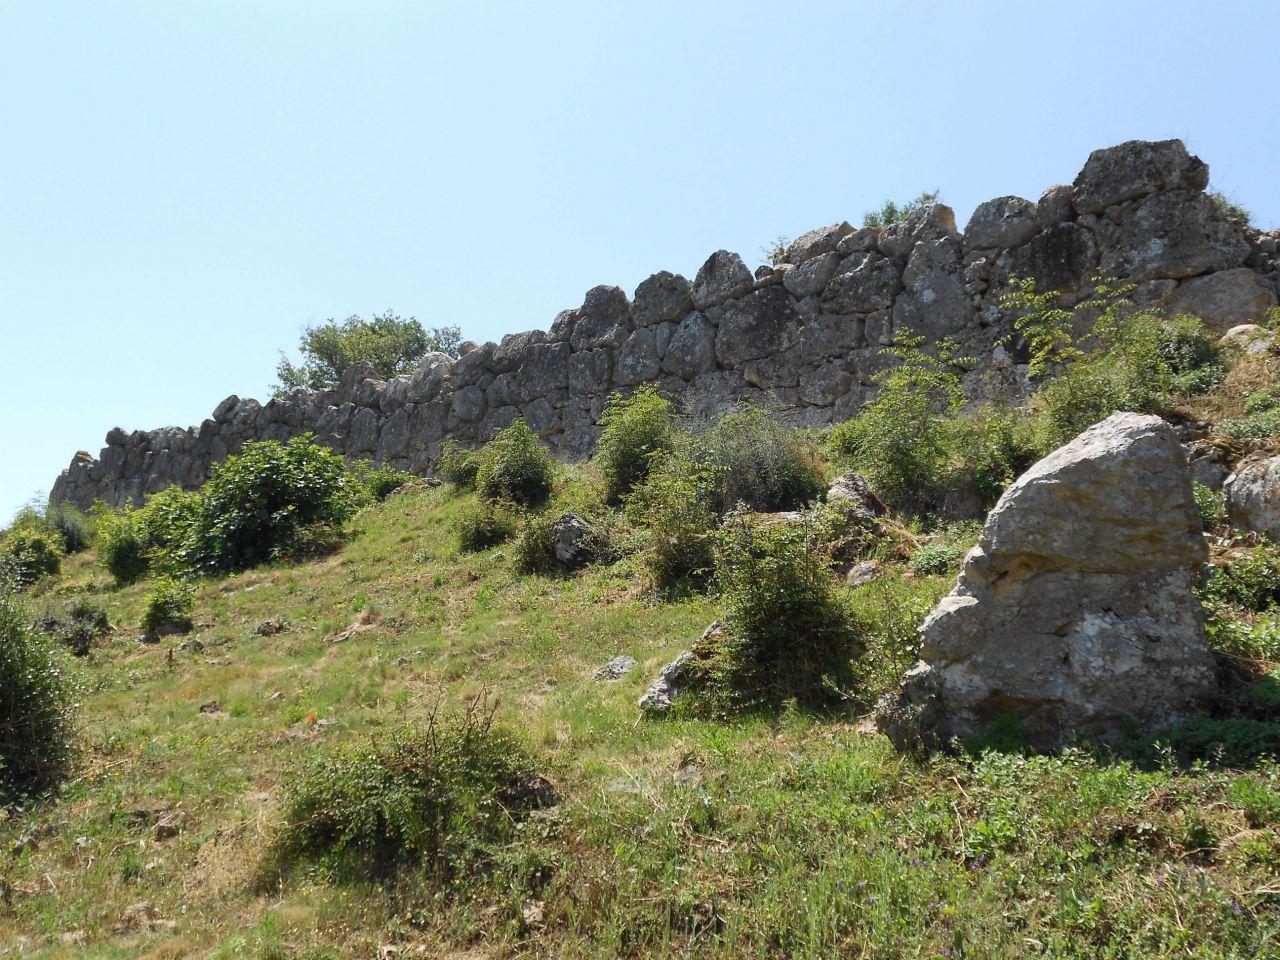 Roselle-Mura-Megalitiche-Roselle-Grosseto-Toscana-Italia-28